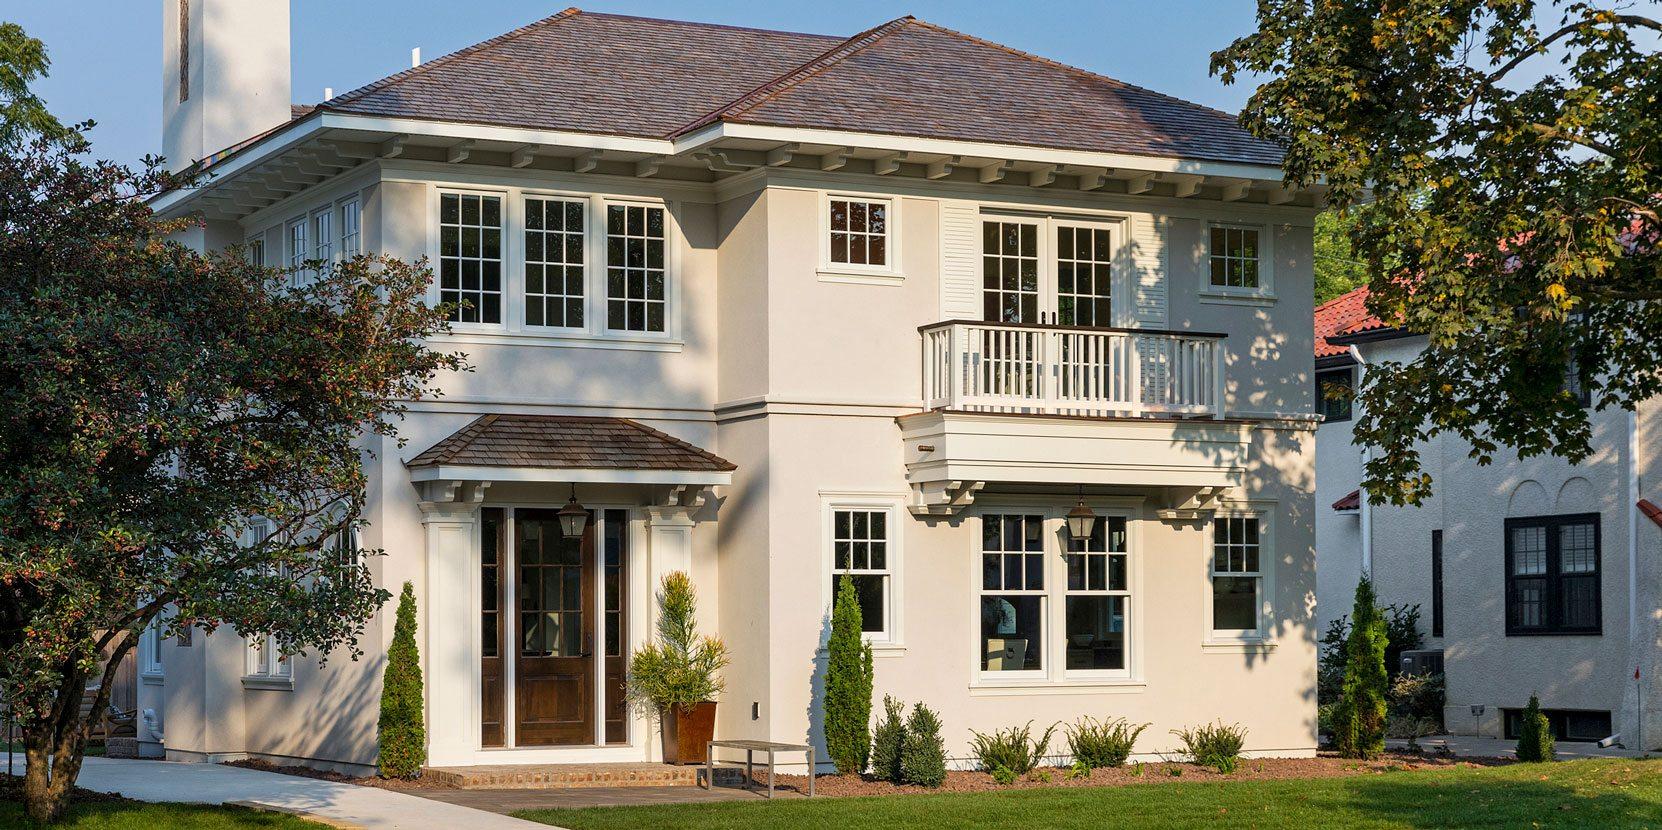 Exterior of Home | Bria Hammel Interiors